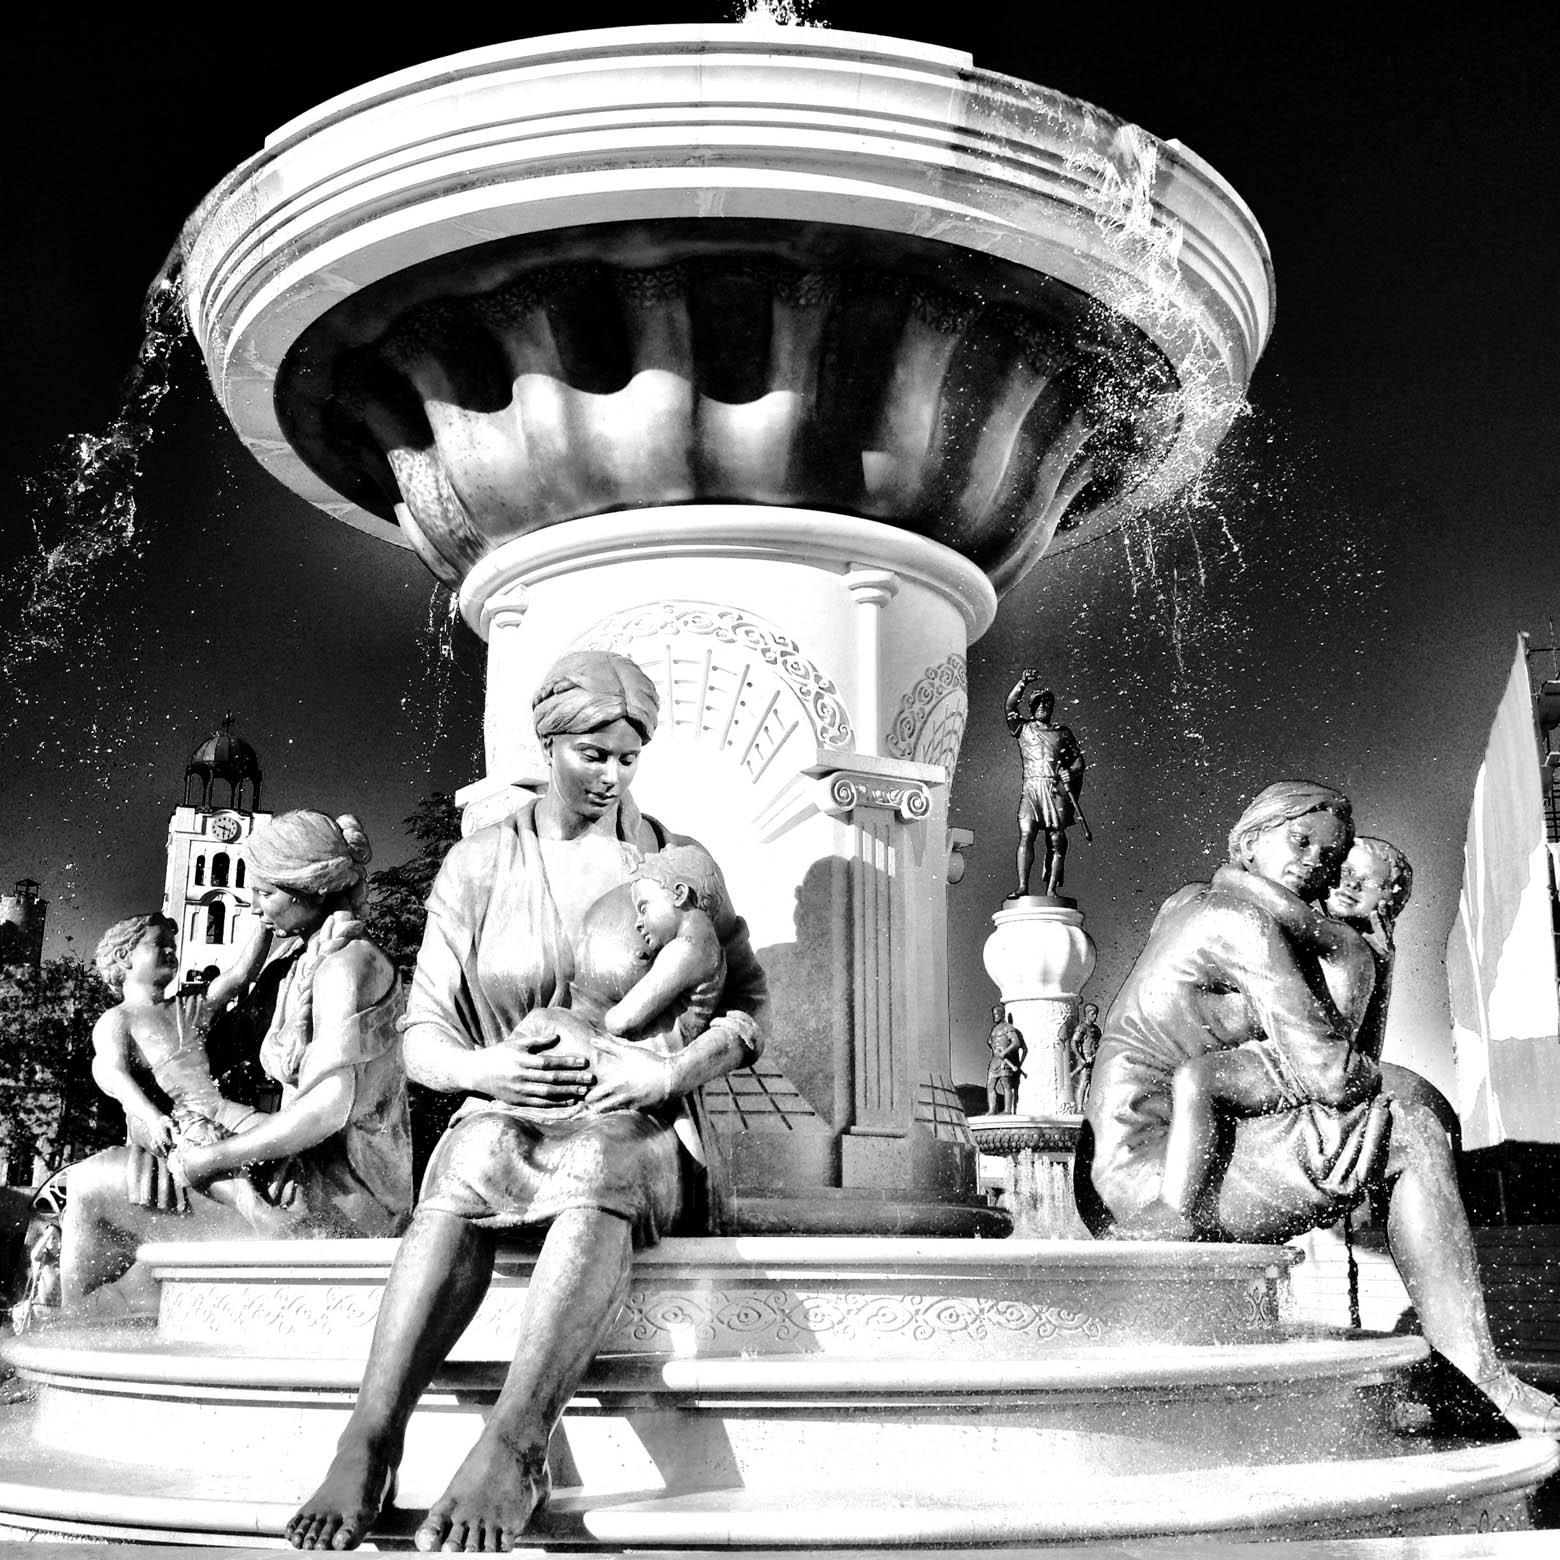 Skopje Mother & Child Fountain Black & White